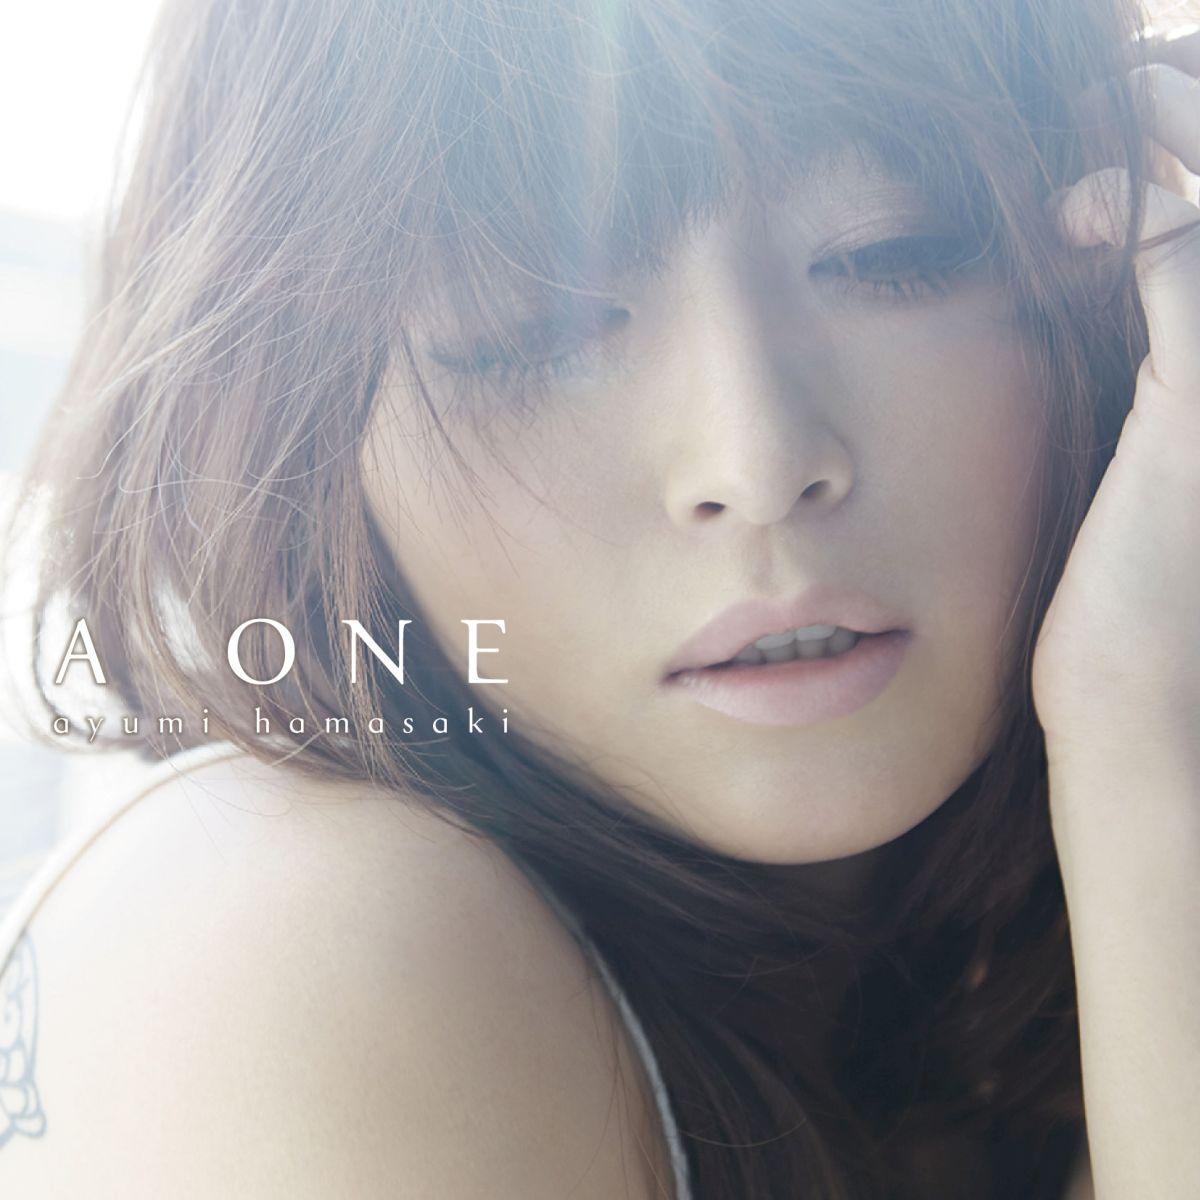 [Album] A ONE - Ayumi Hamasaki (浜崎あゆみ)